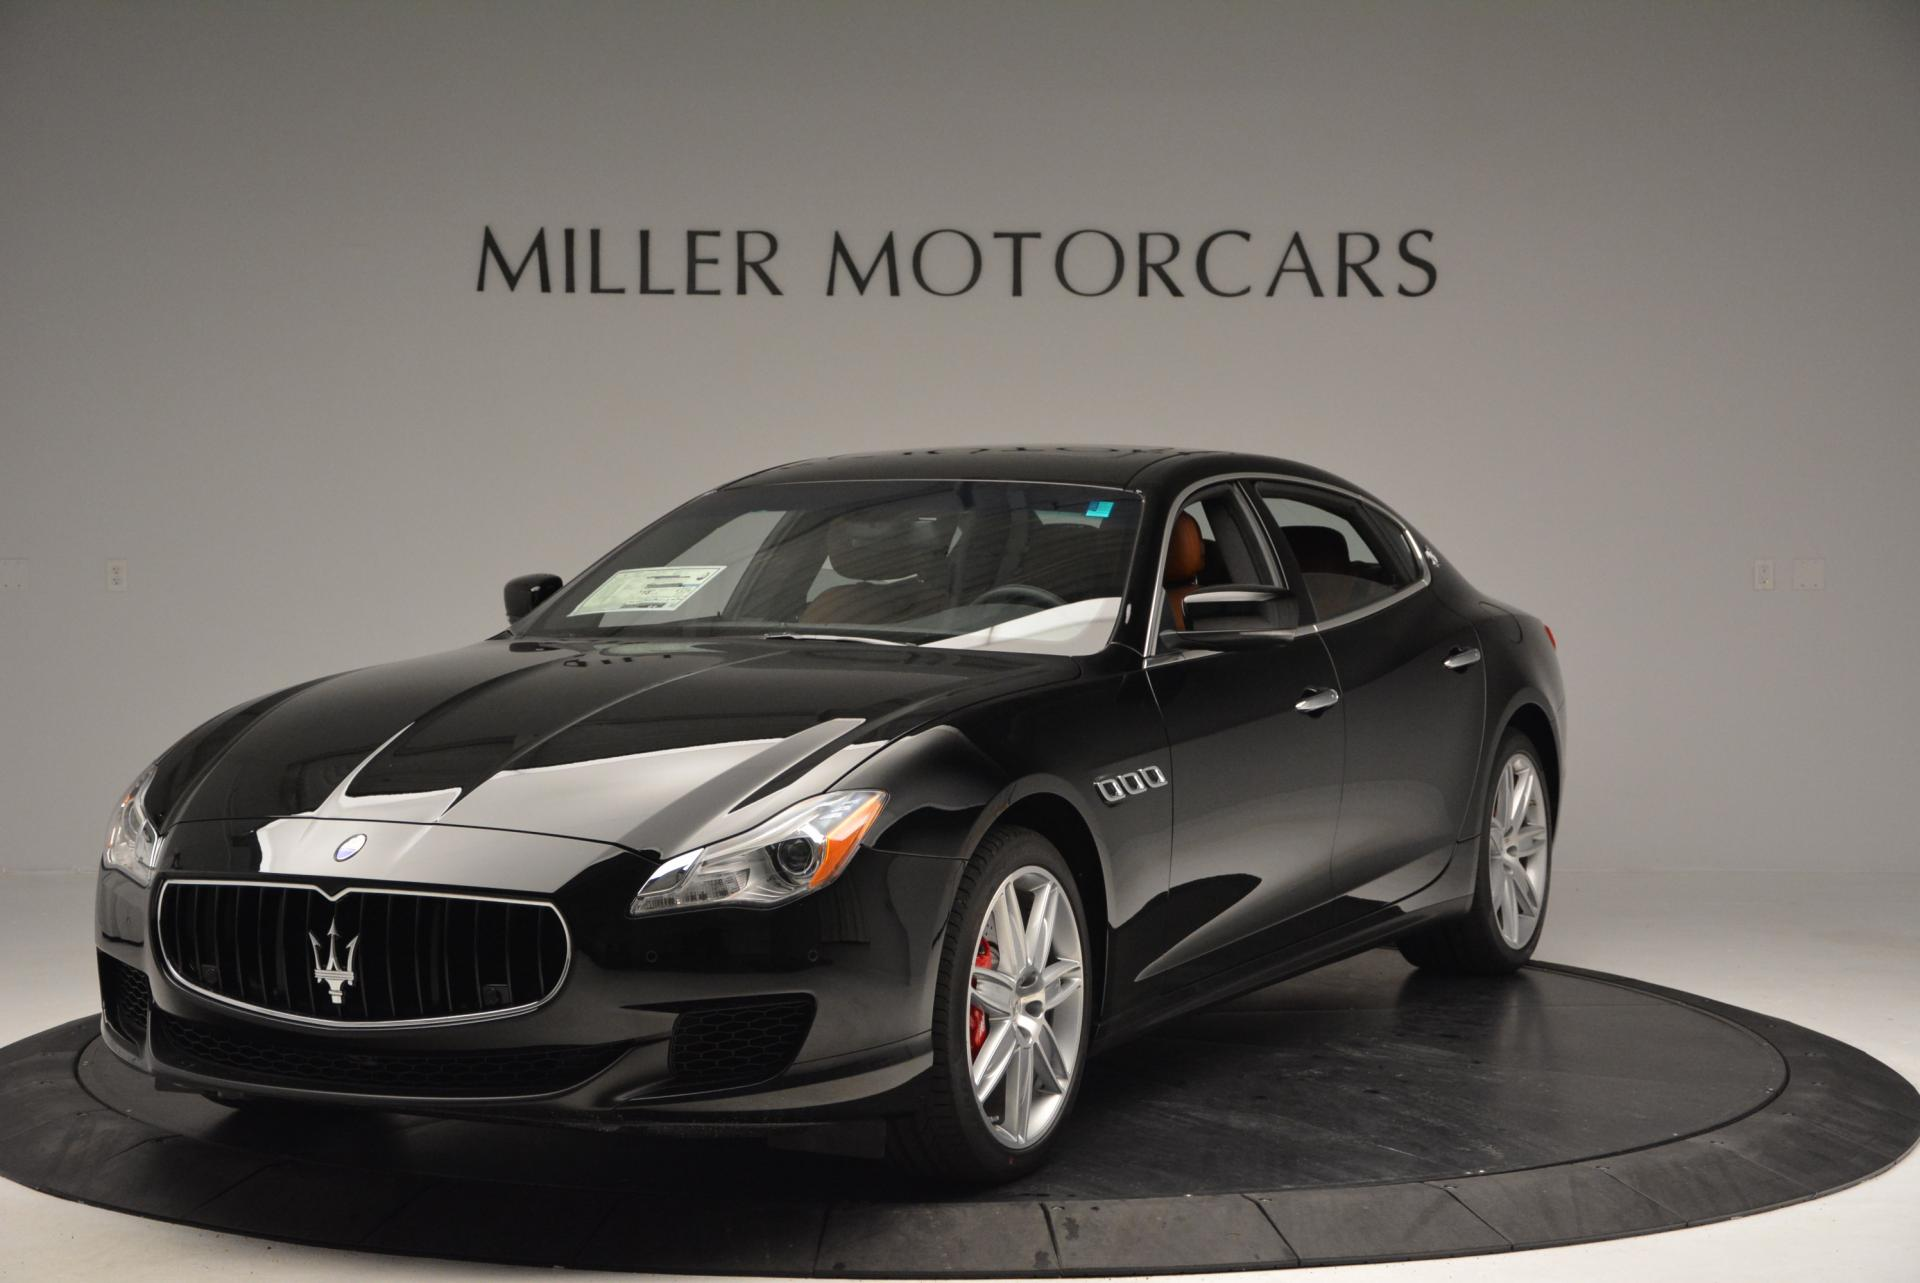 New 2016 Maserati Quattroporte S Q4 for sale Sold at Bentley Greenwich in Greenwich CT 06830 1